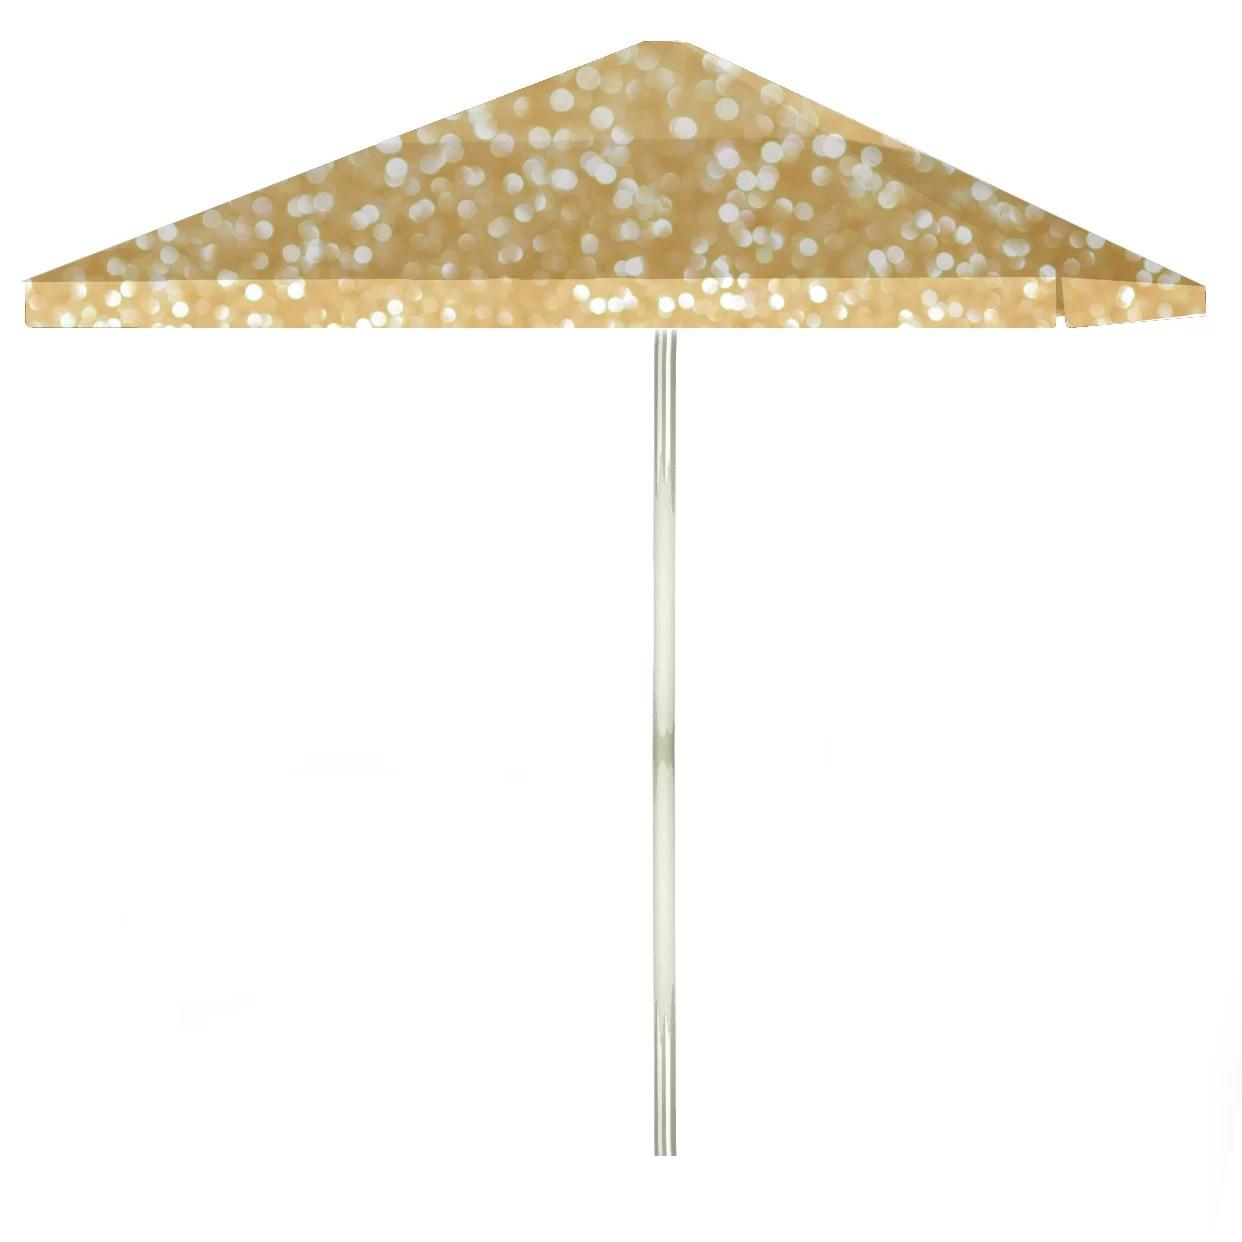 glitter me gold 72 x 72 rectangular market umbrella